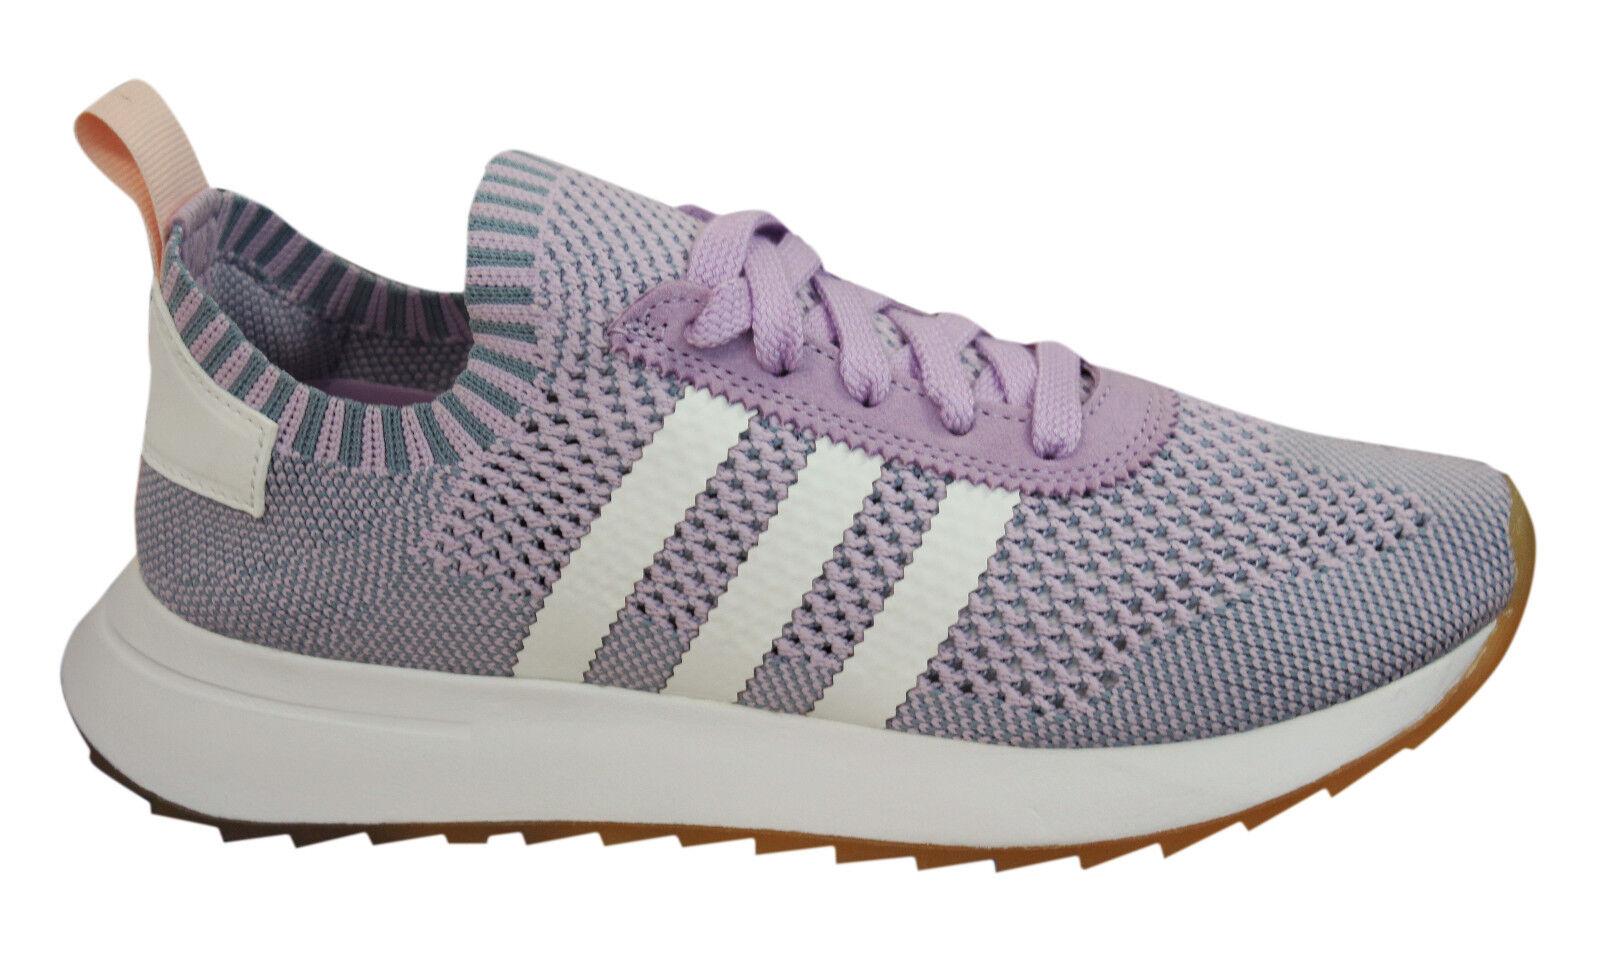 Adidas Originals Flash Back Primeknit Damenschuhe Trainers Lace Up Schuhes BY9103 U60